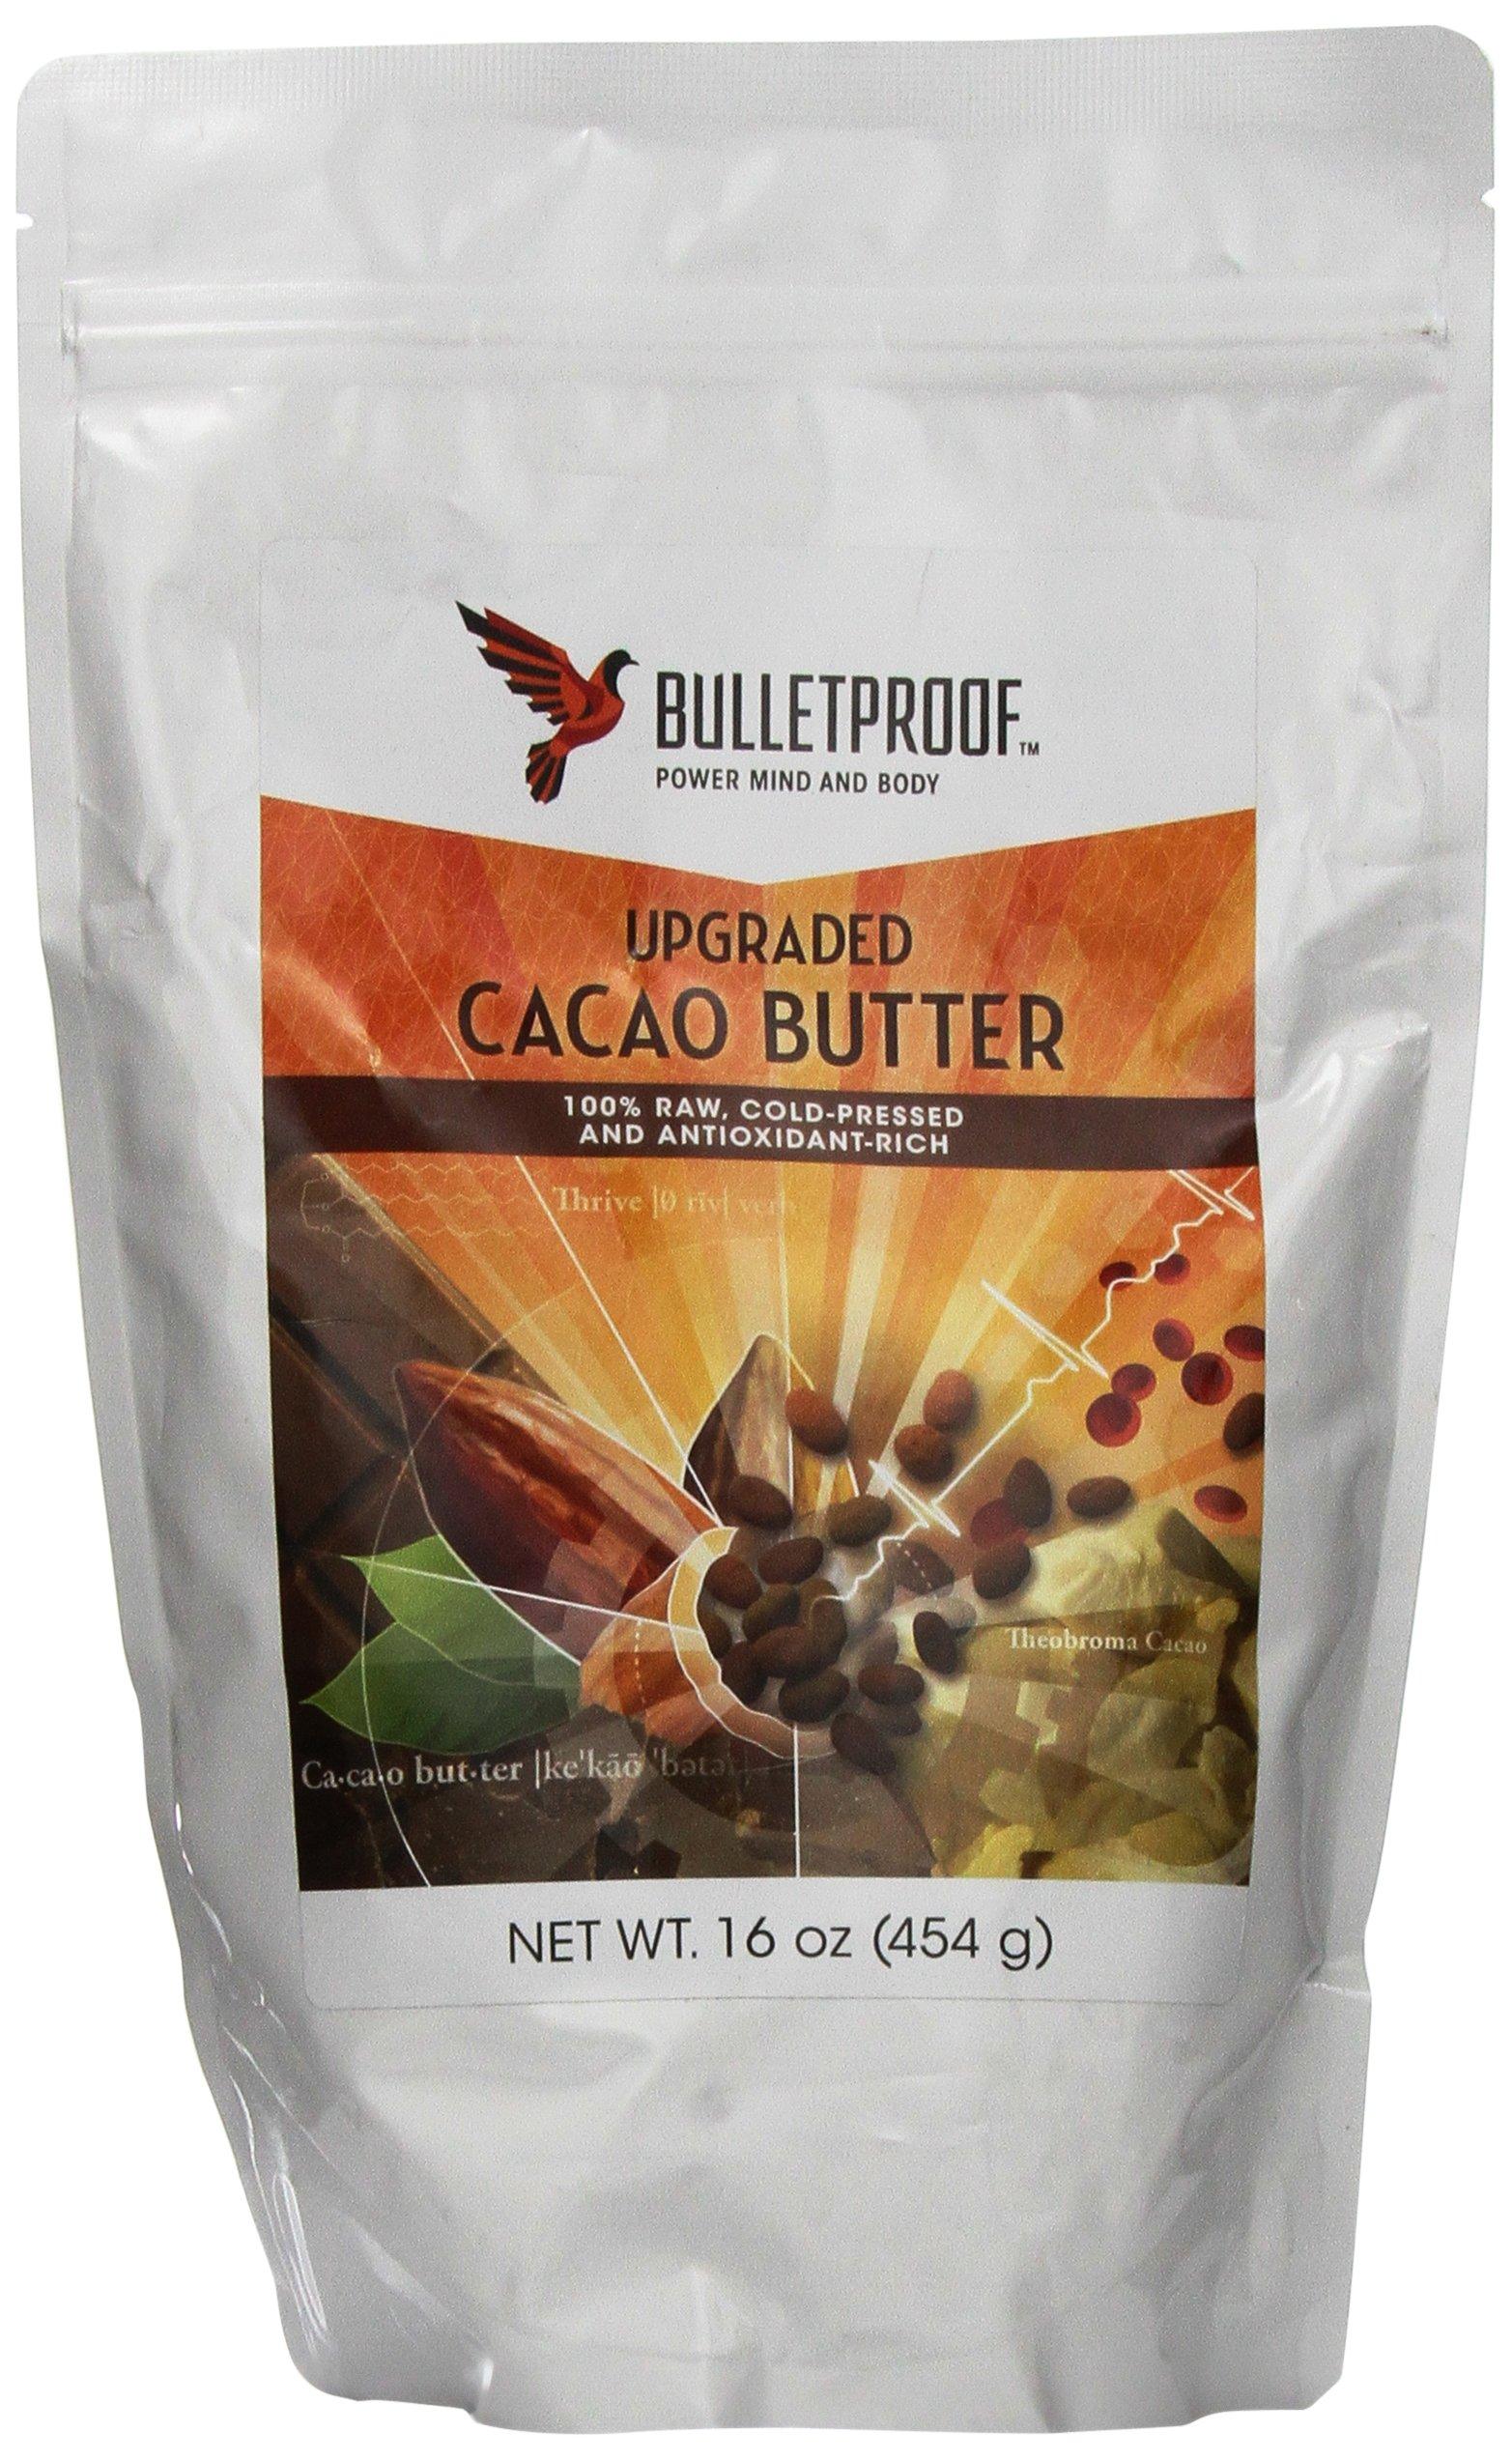 Bulletproof Cacao Butter 16 oz by Bulletproof (Image #1)